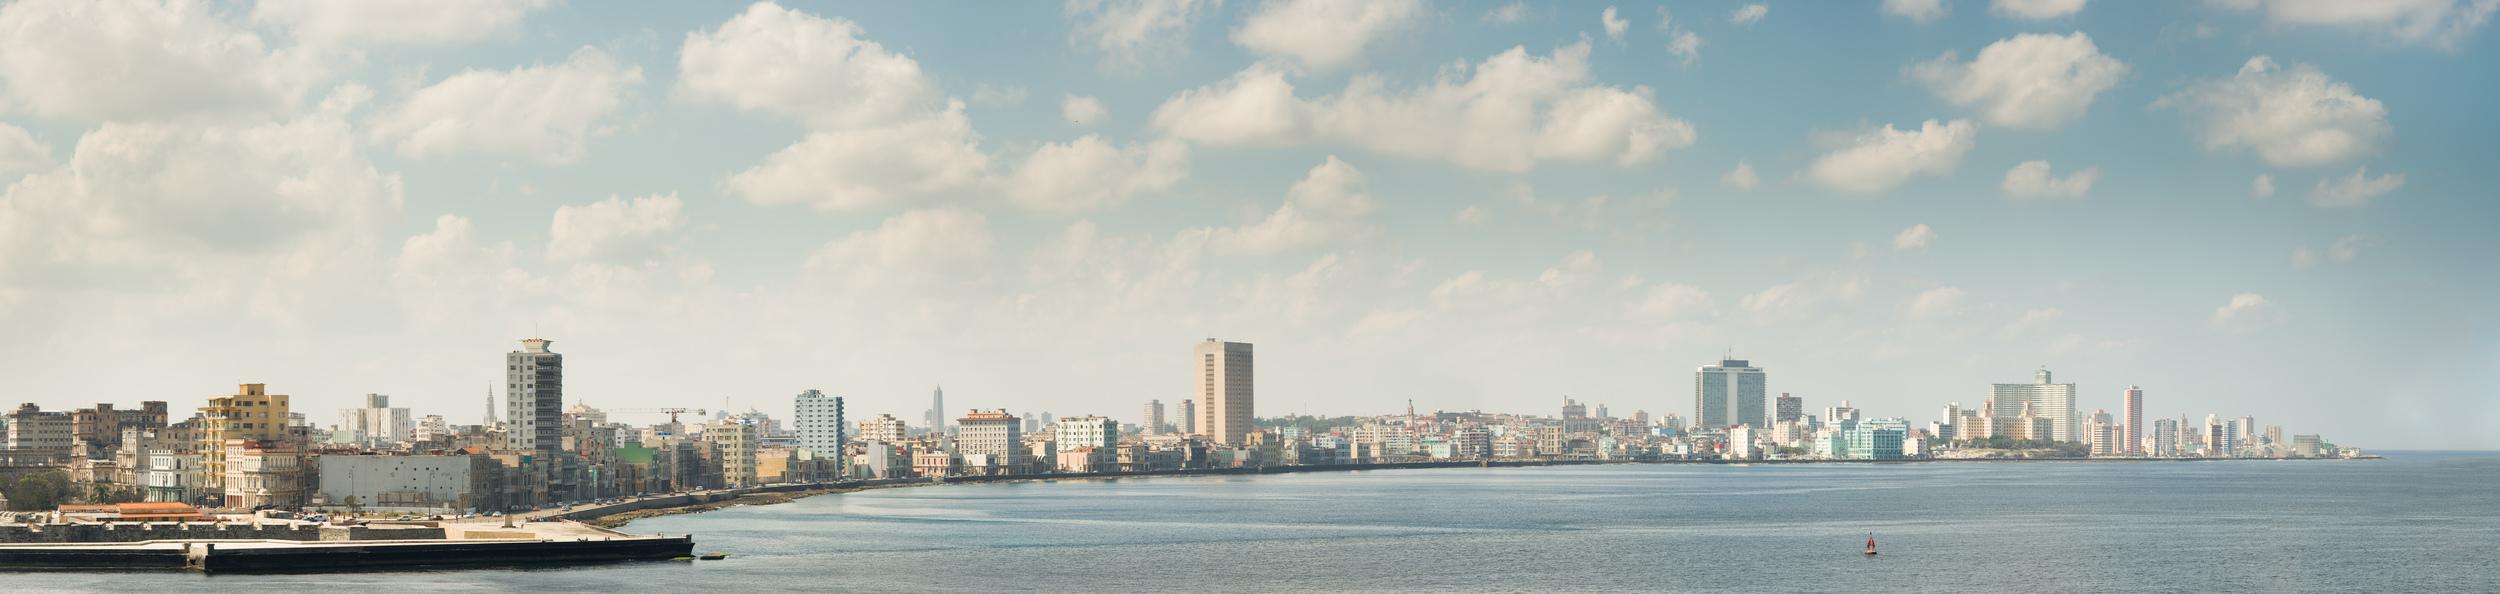 _TRB5063_Havana Cityscape-Edit.jpg